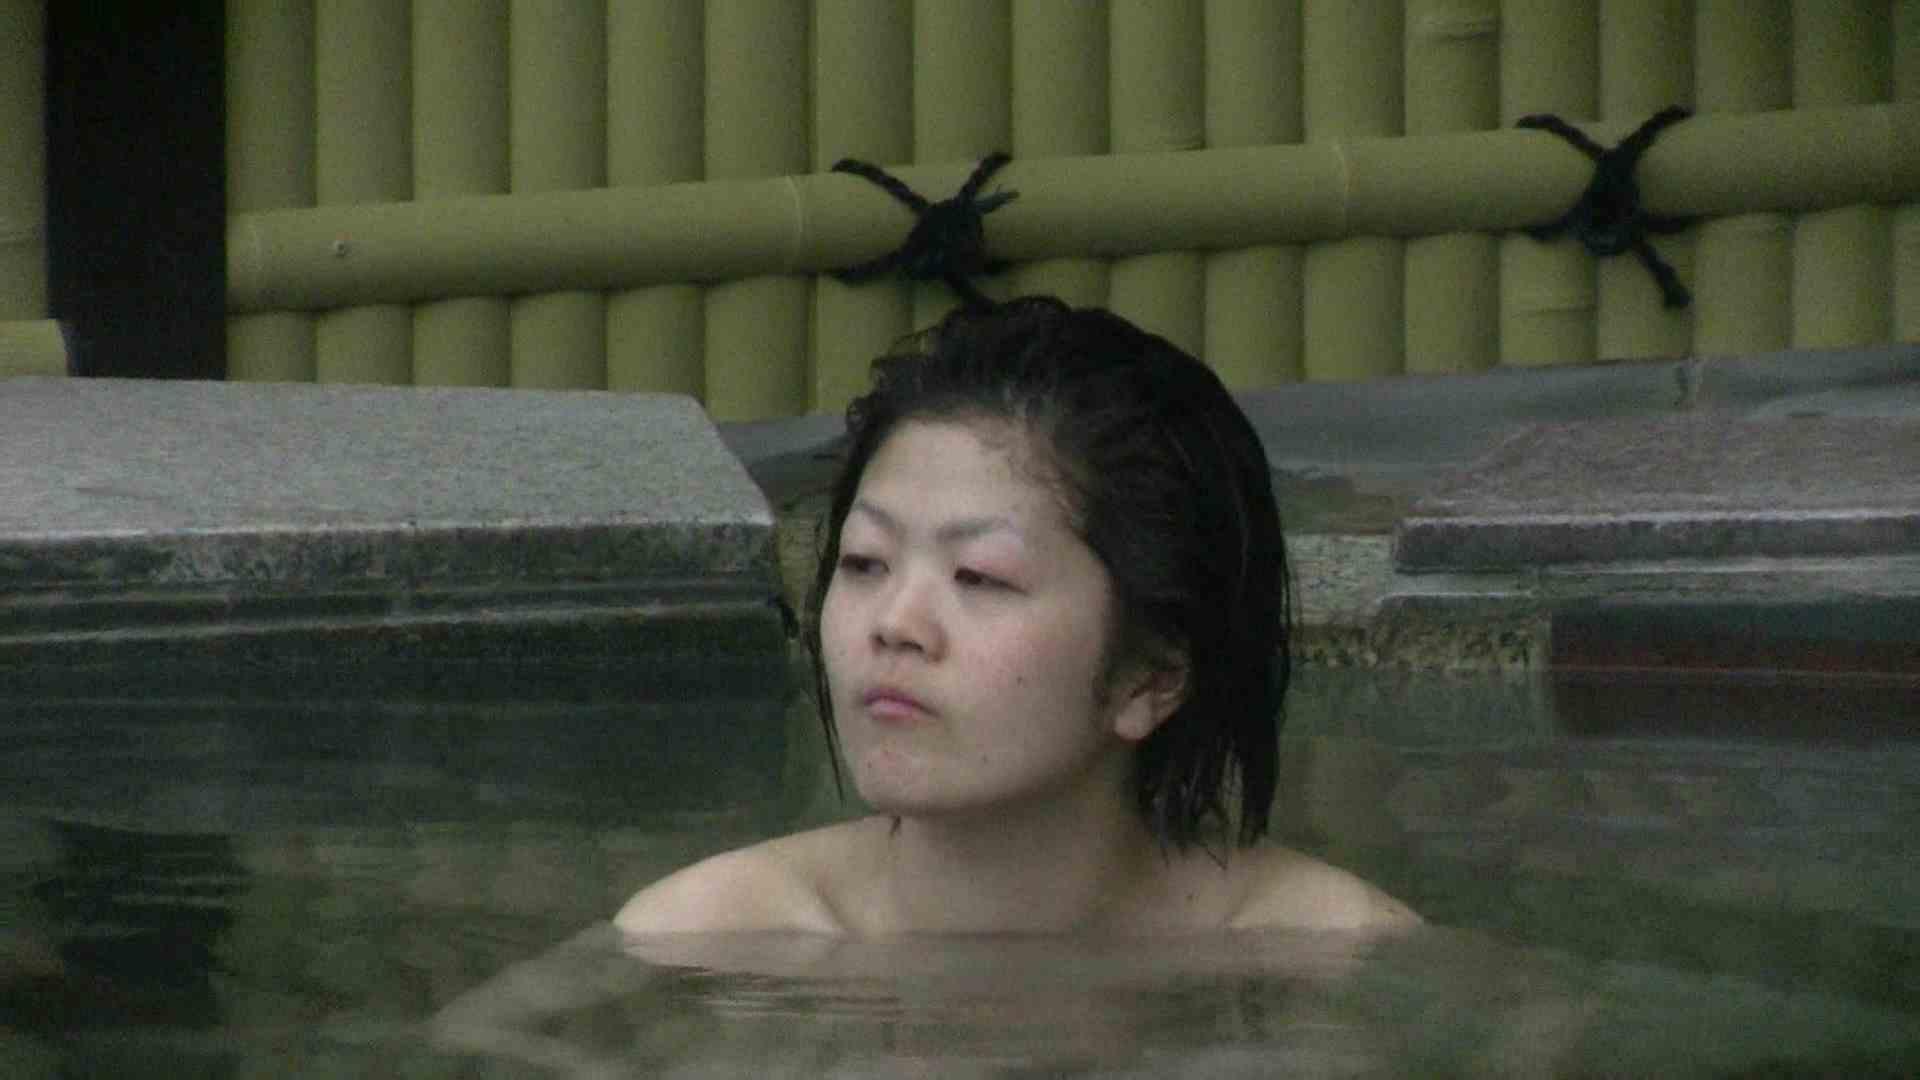 Aquaな露天風呂Vol.538 露天風呂 AV無料 90連発 56